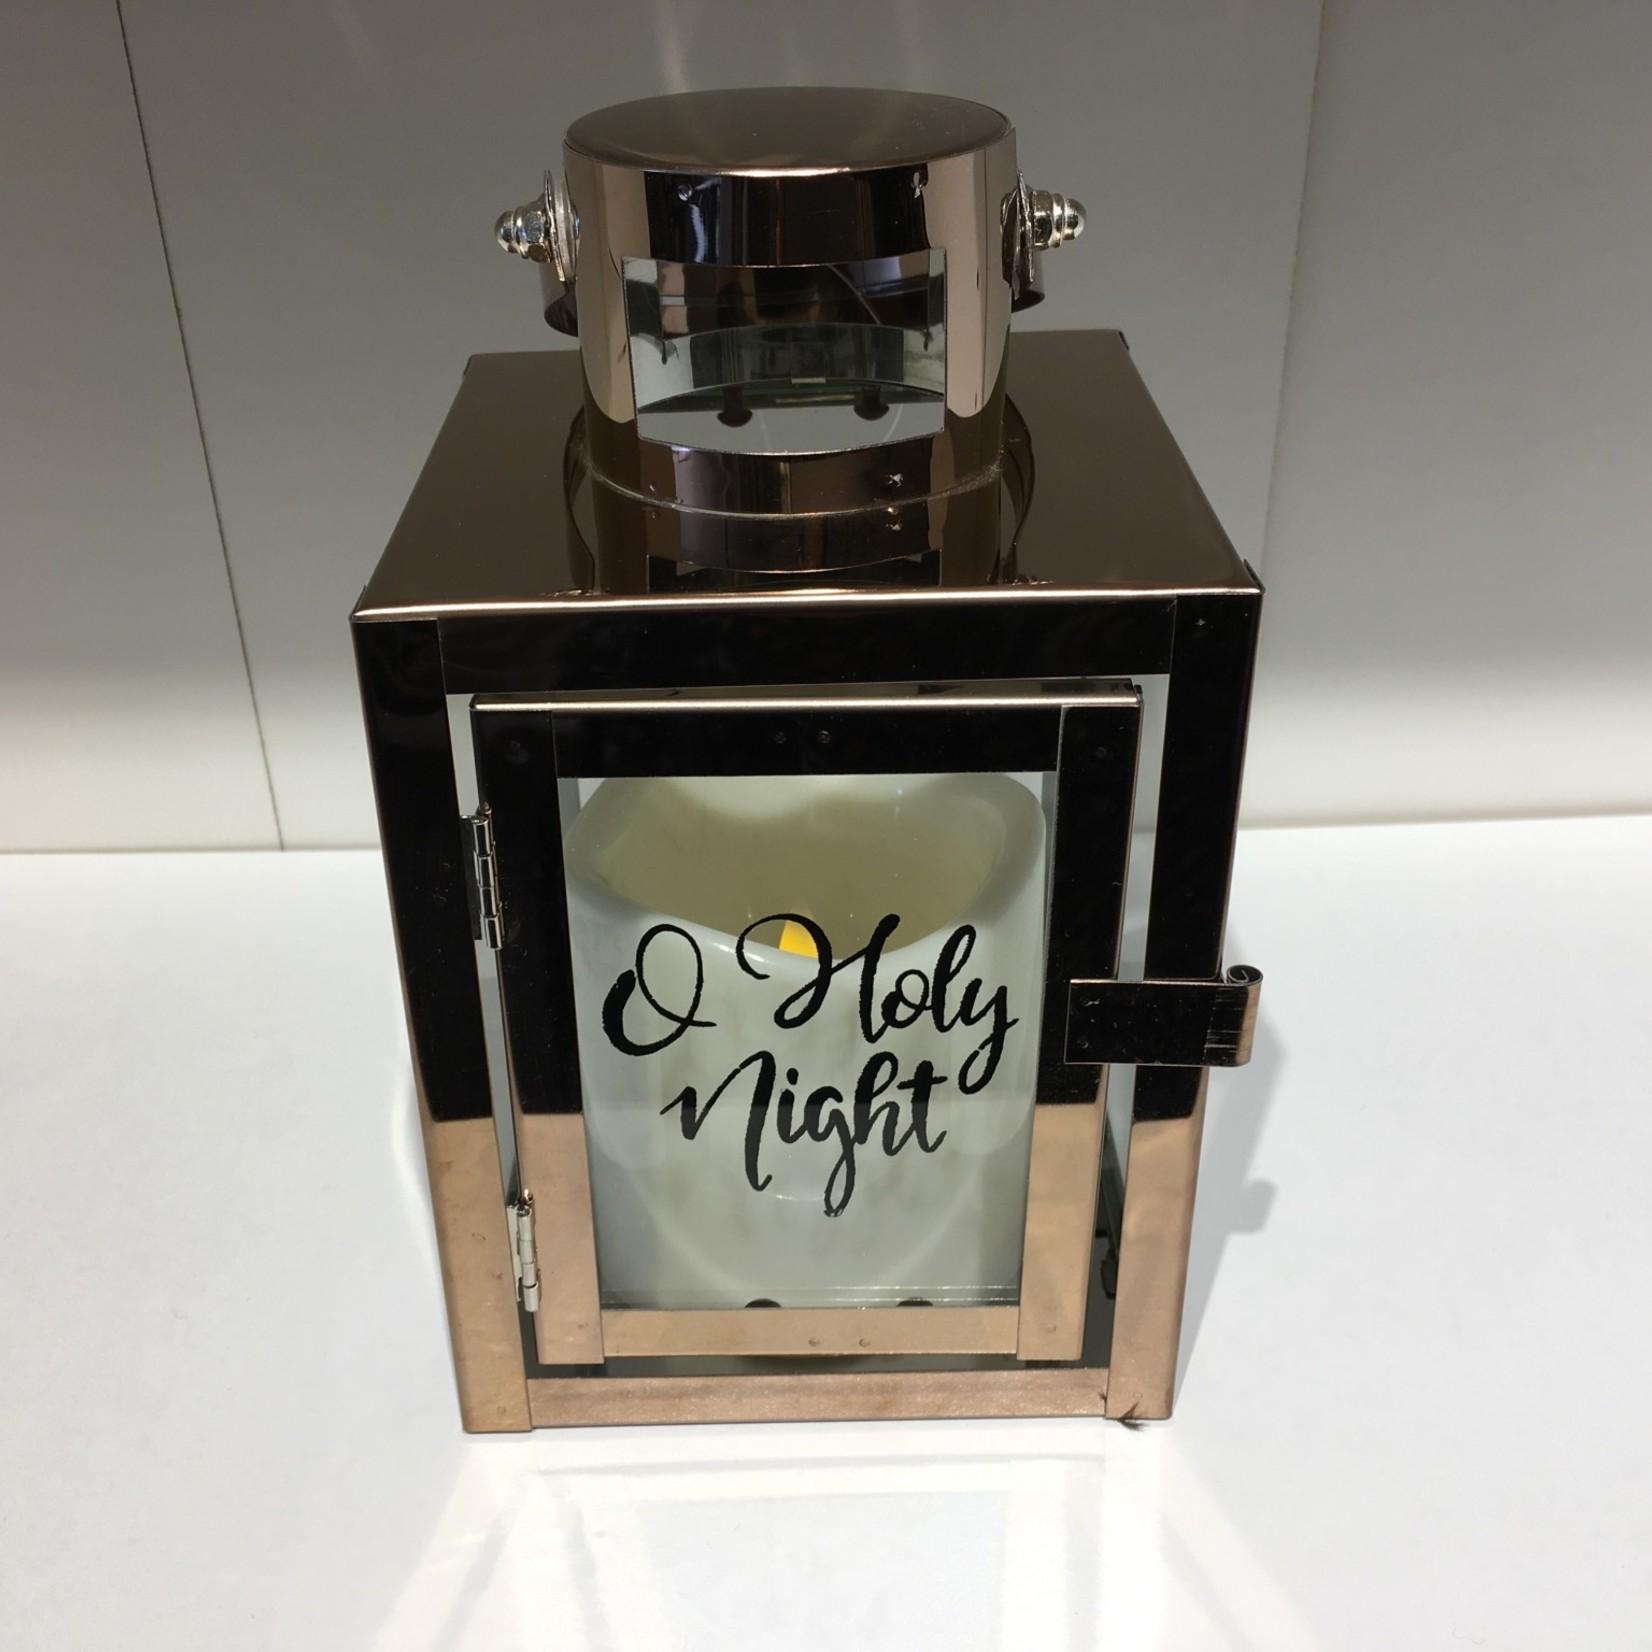 "Lantern w/ Candle - O Holy Night 4.25x8.75"""